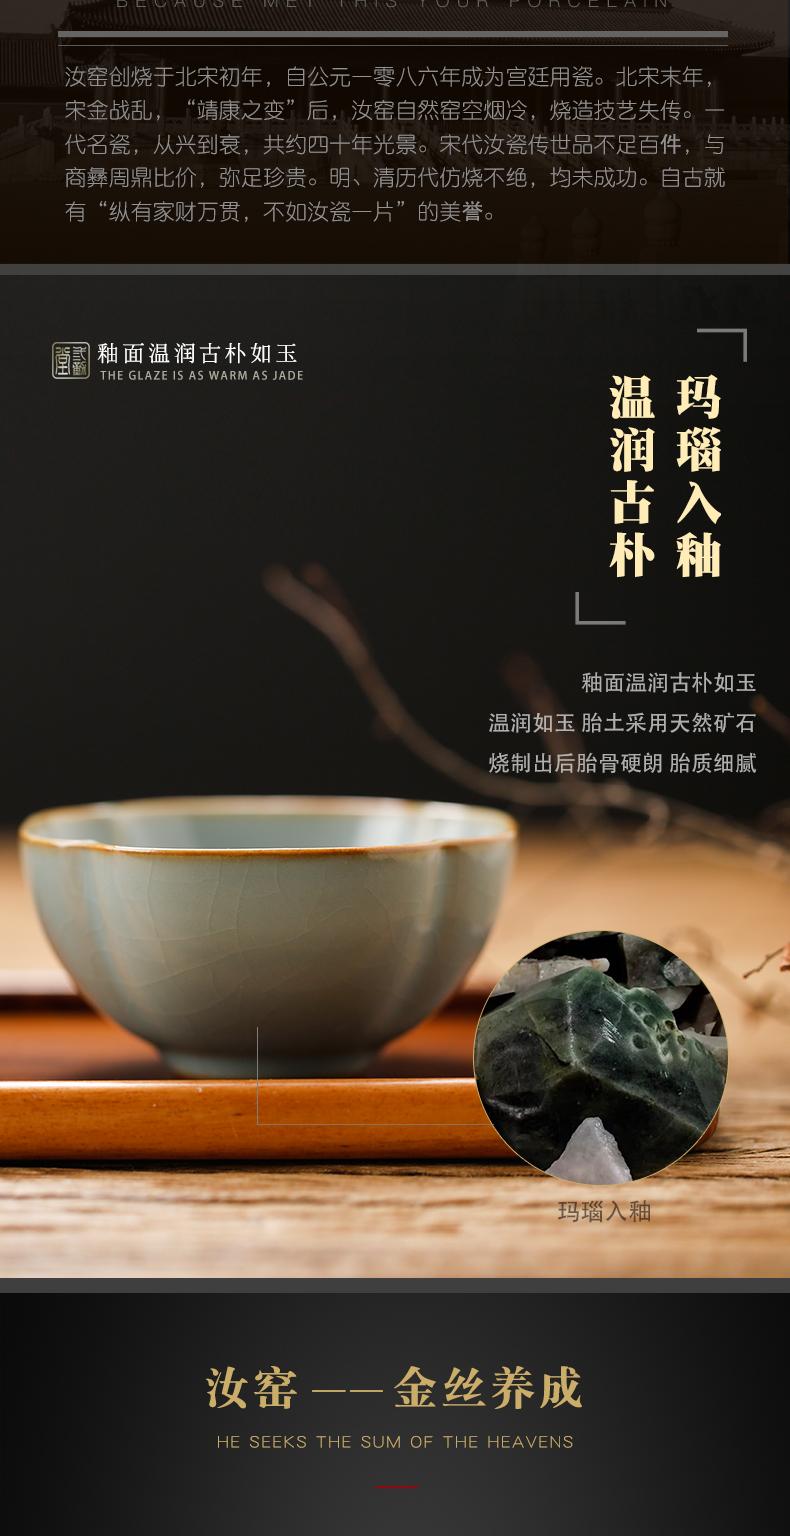 Three ru up market metrix who frequently hall cups sliced open may raise S44046 pu - erh tea cups of jingdezhen ceramic kung fu tea set single CPU